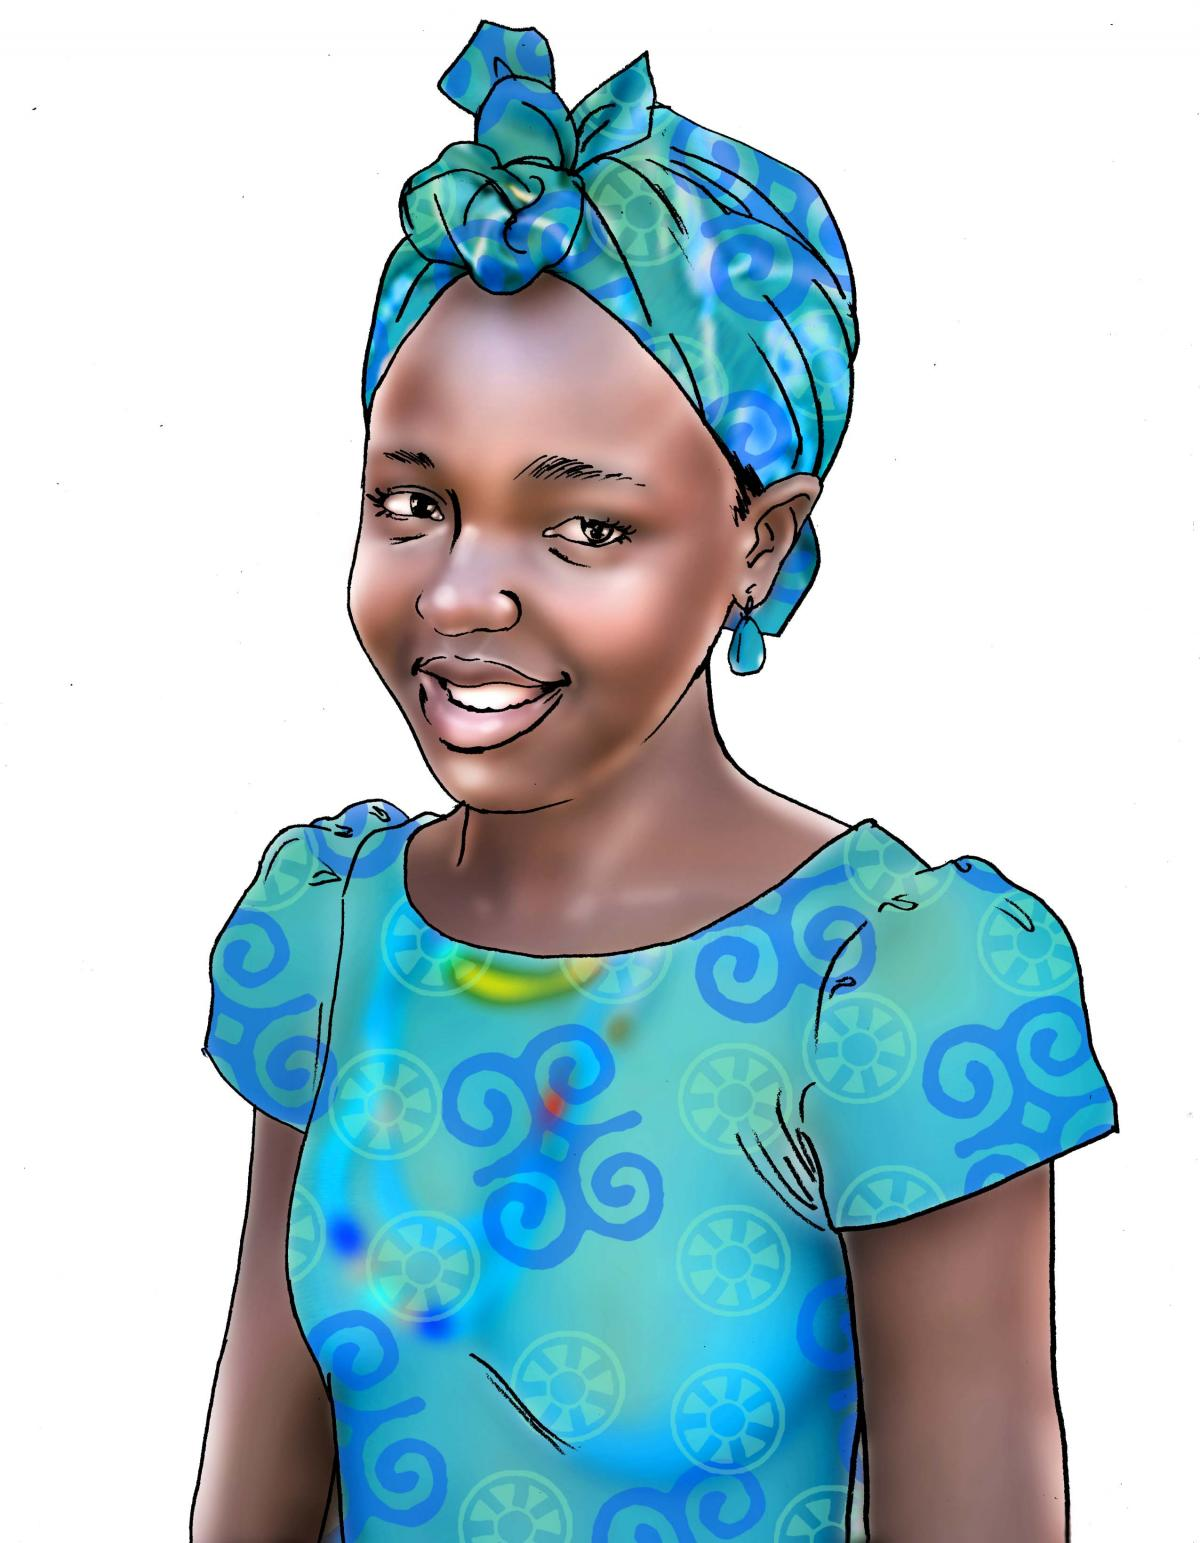 People - Adolescent - 00 - Niger